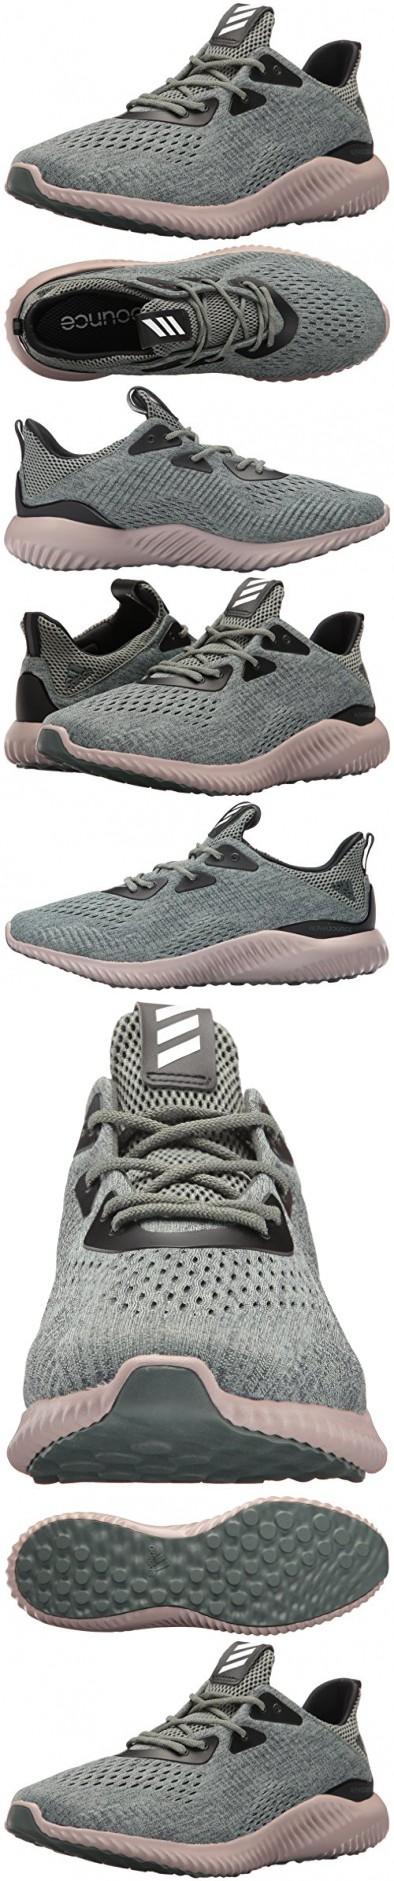 Adidas Performance Men S Alphabounce Em Running Shoe Utility Ivy